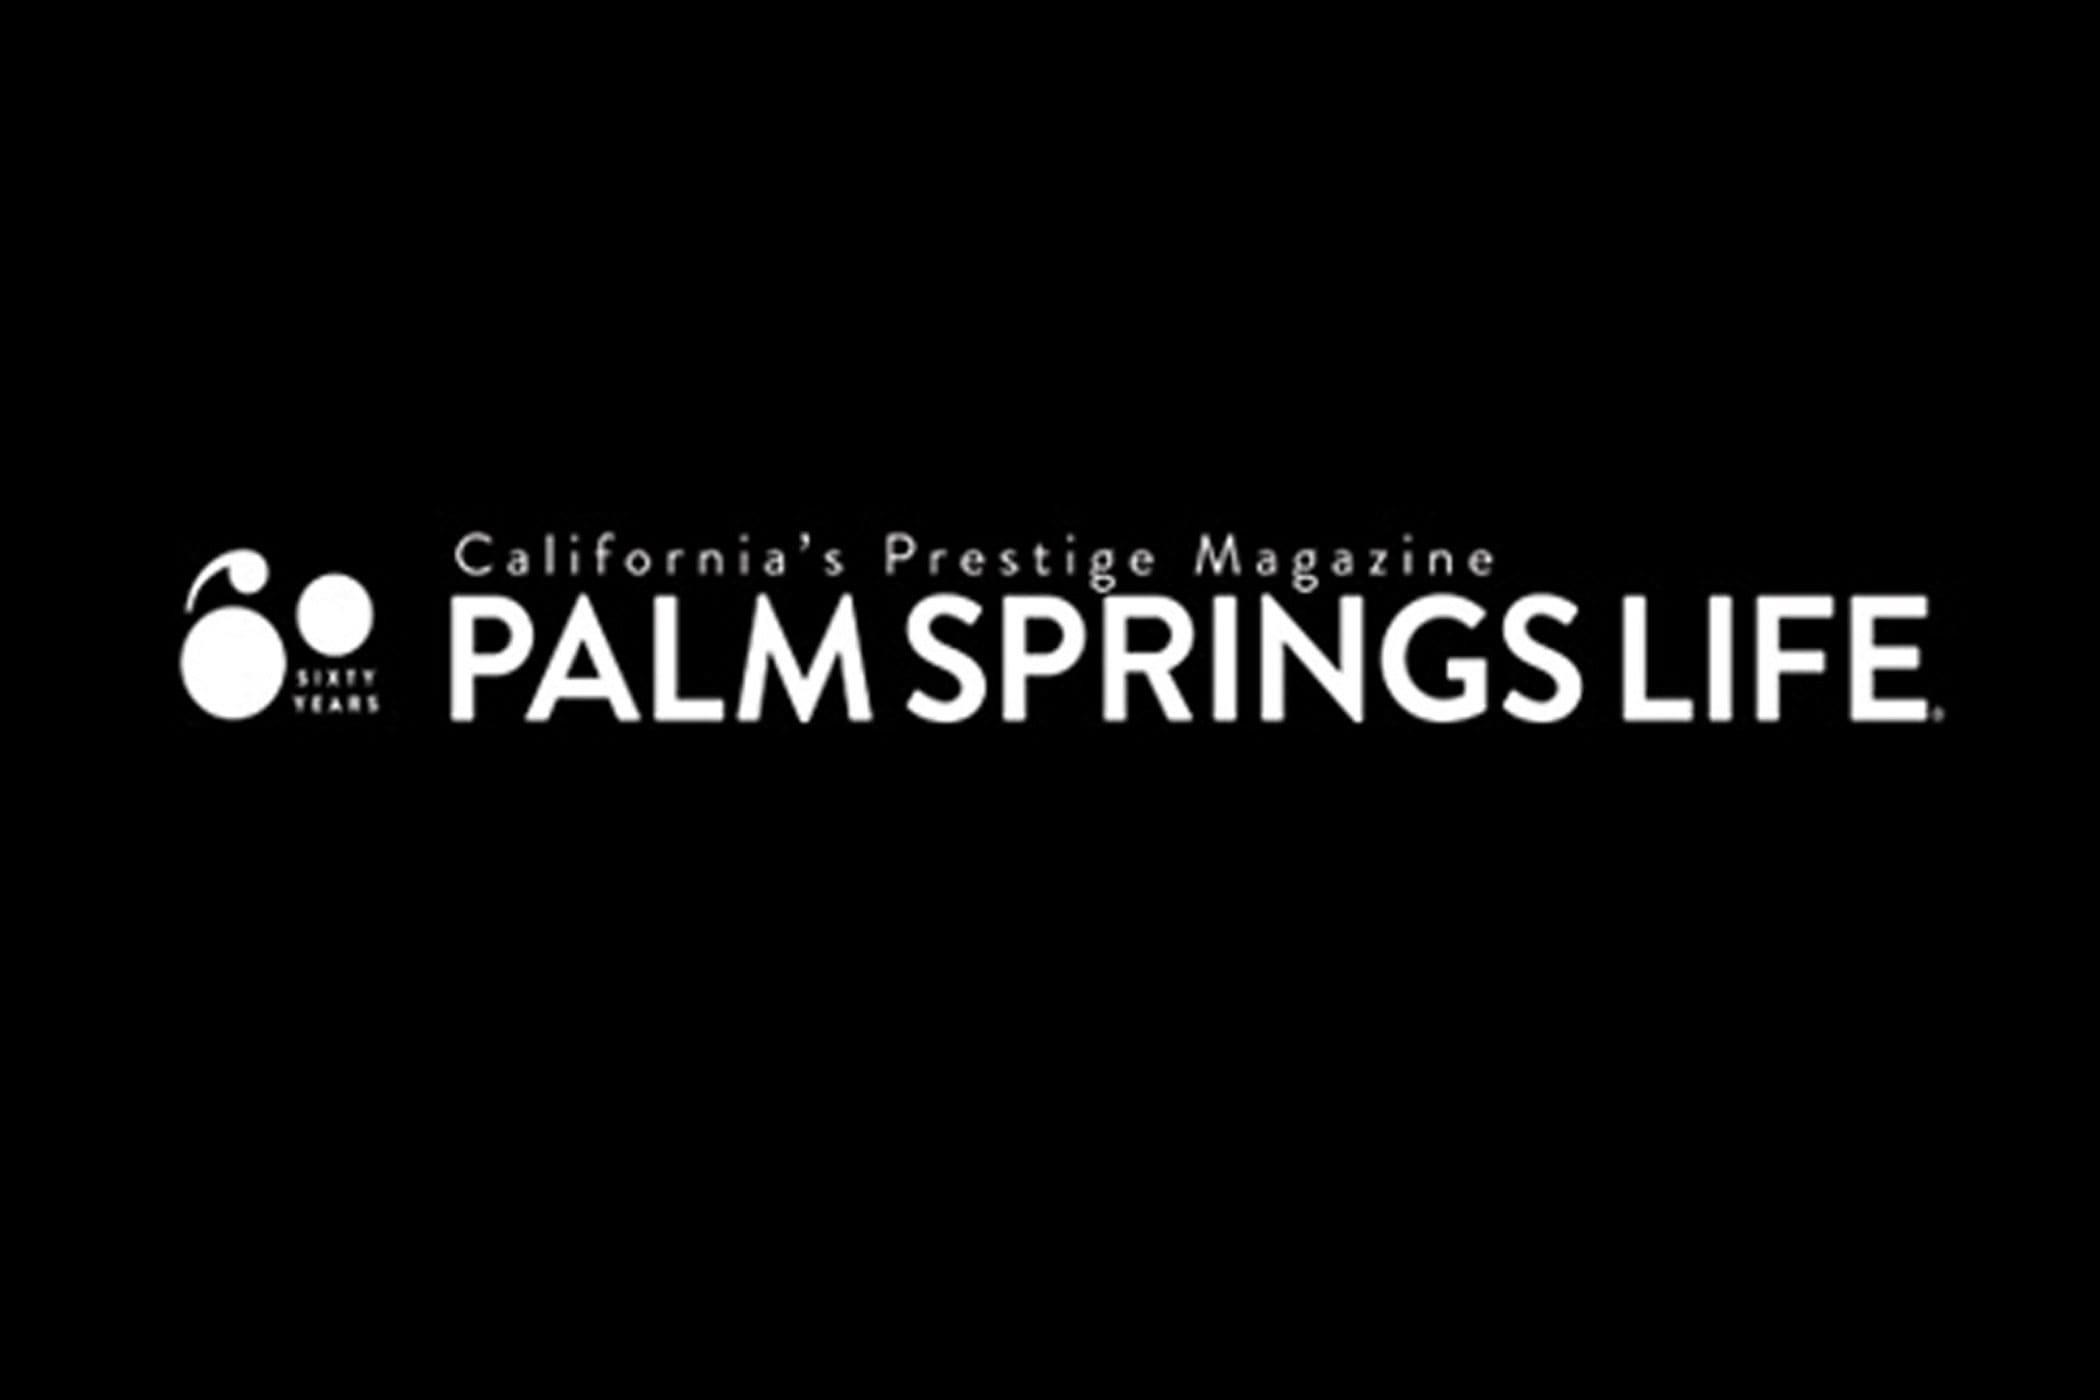 Palm Springs Life Studio Lux